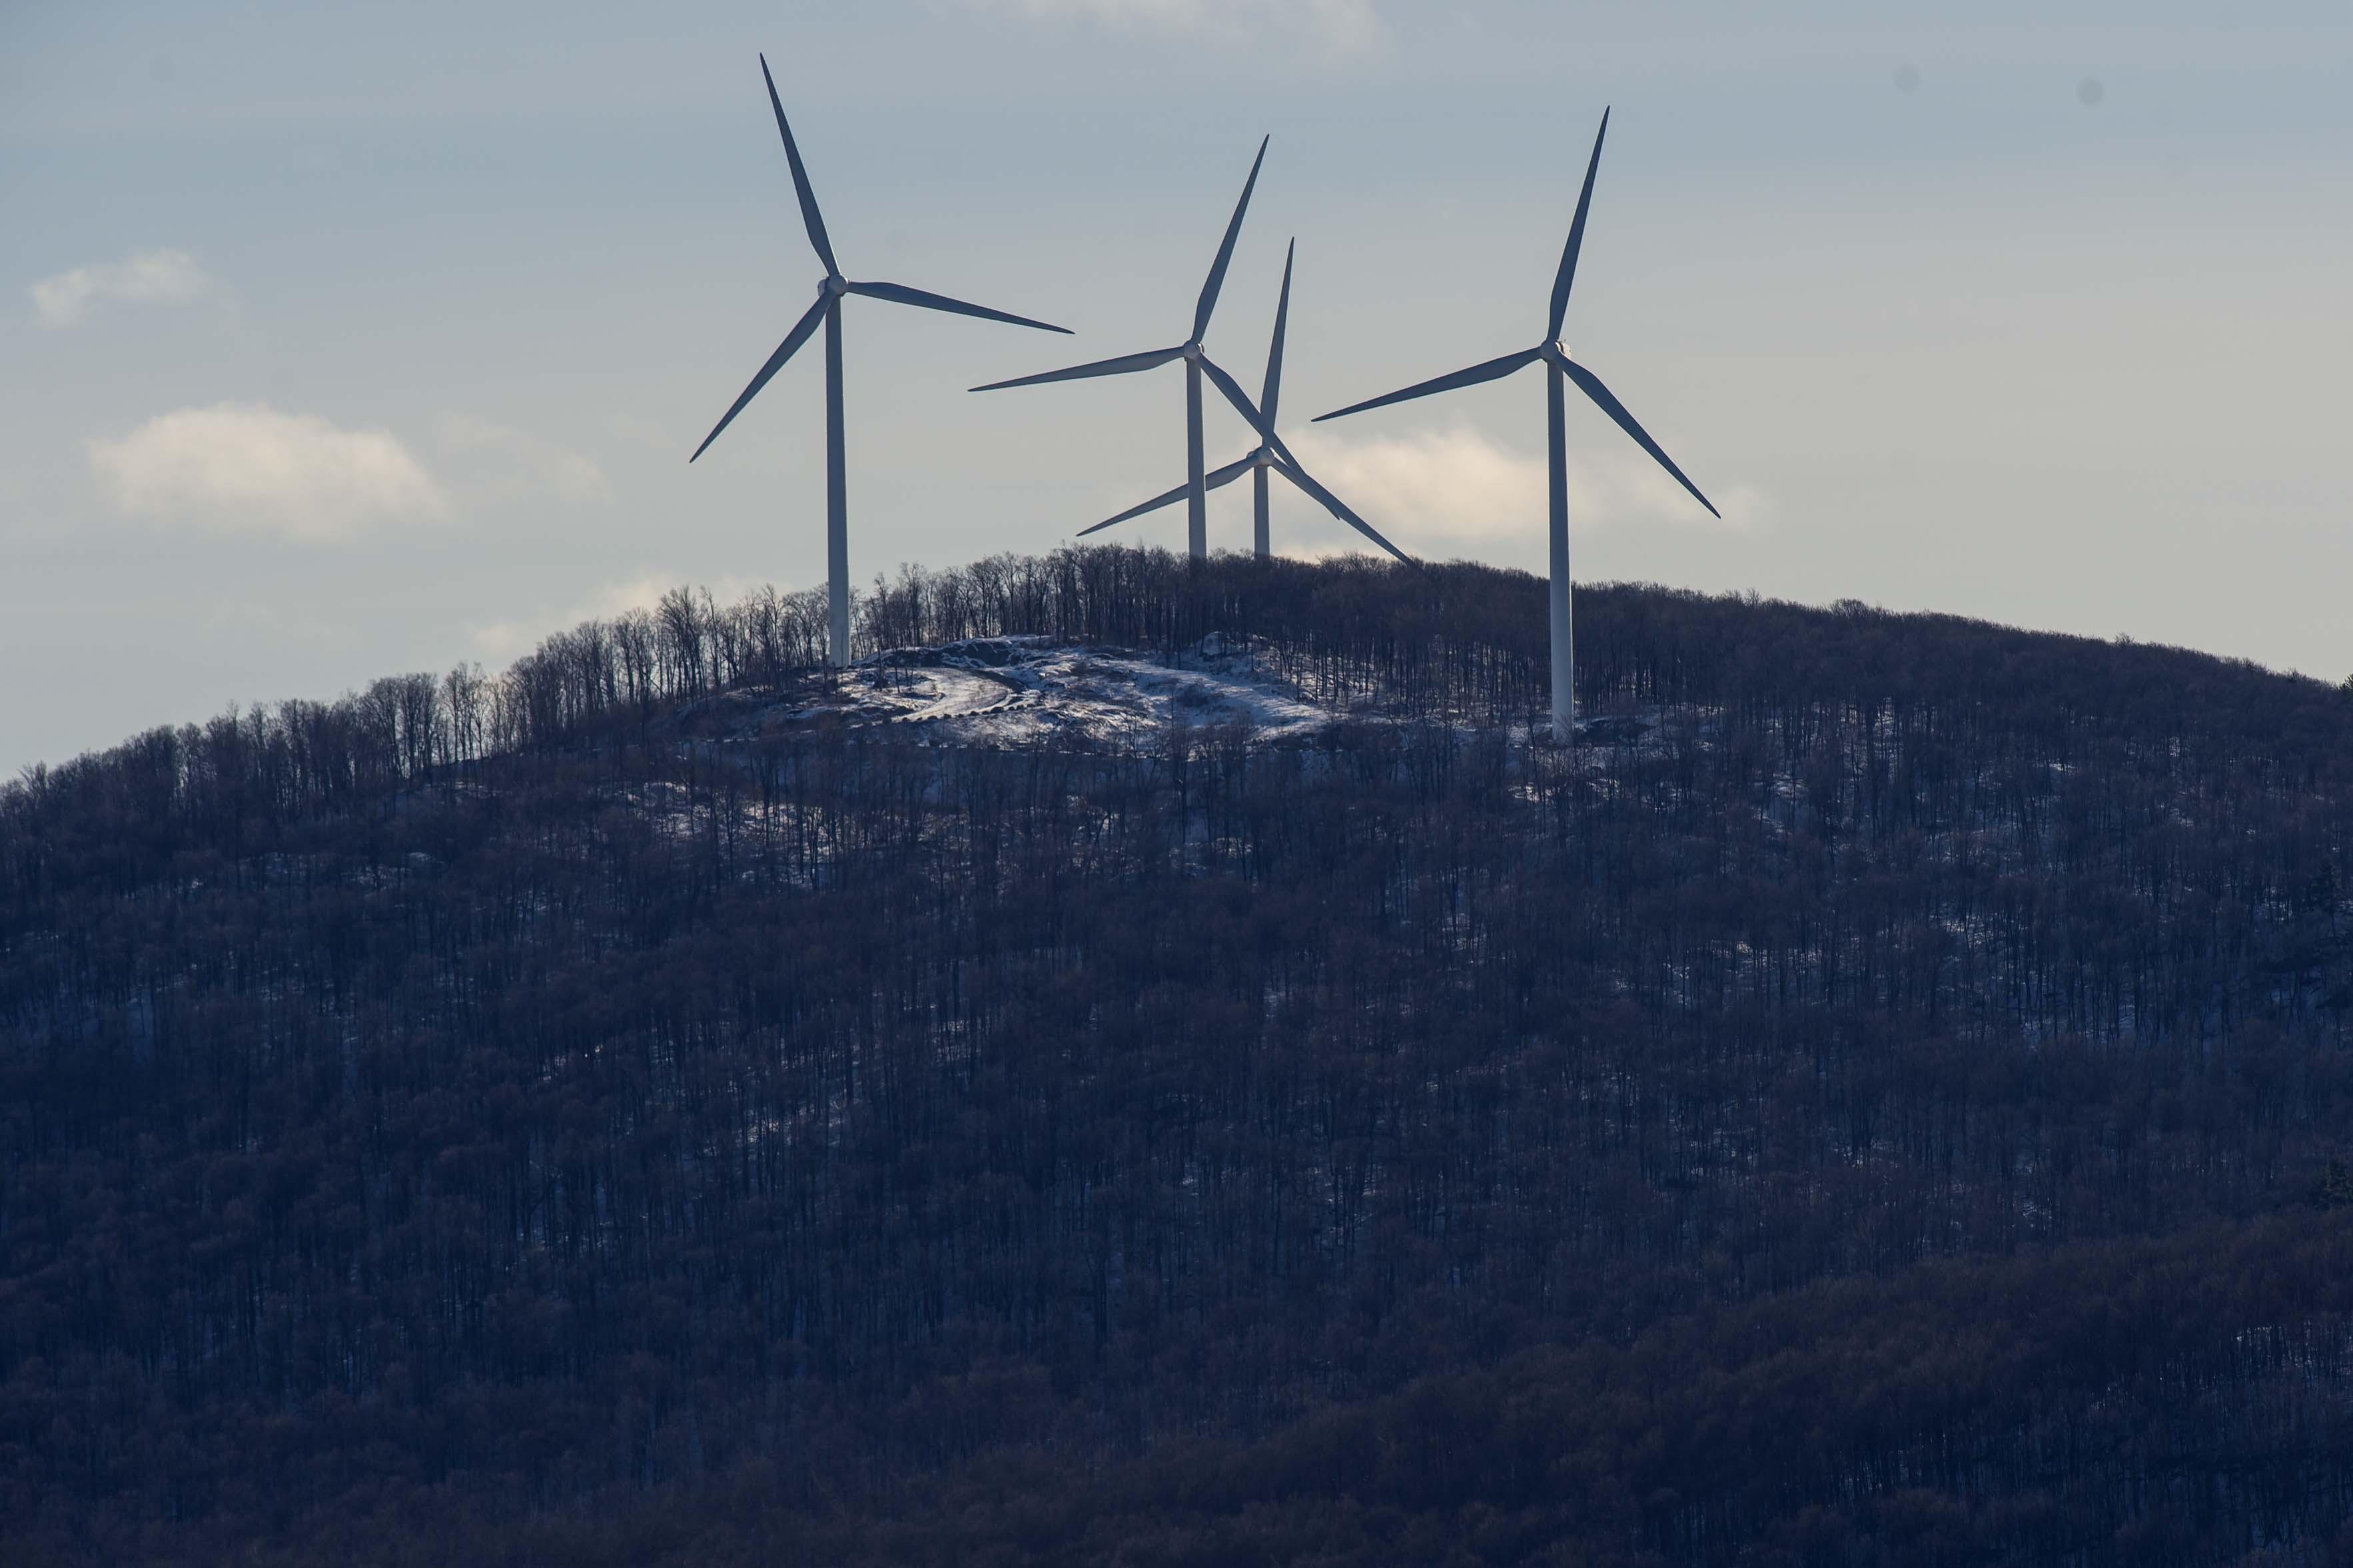 BUR20160121WIND1 Buy Photo. The Four Wind Turbines ...